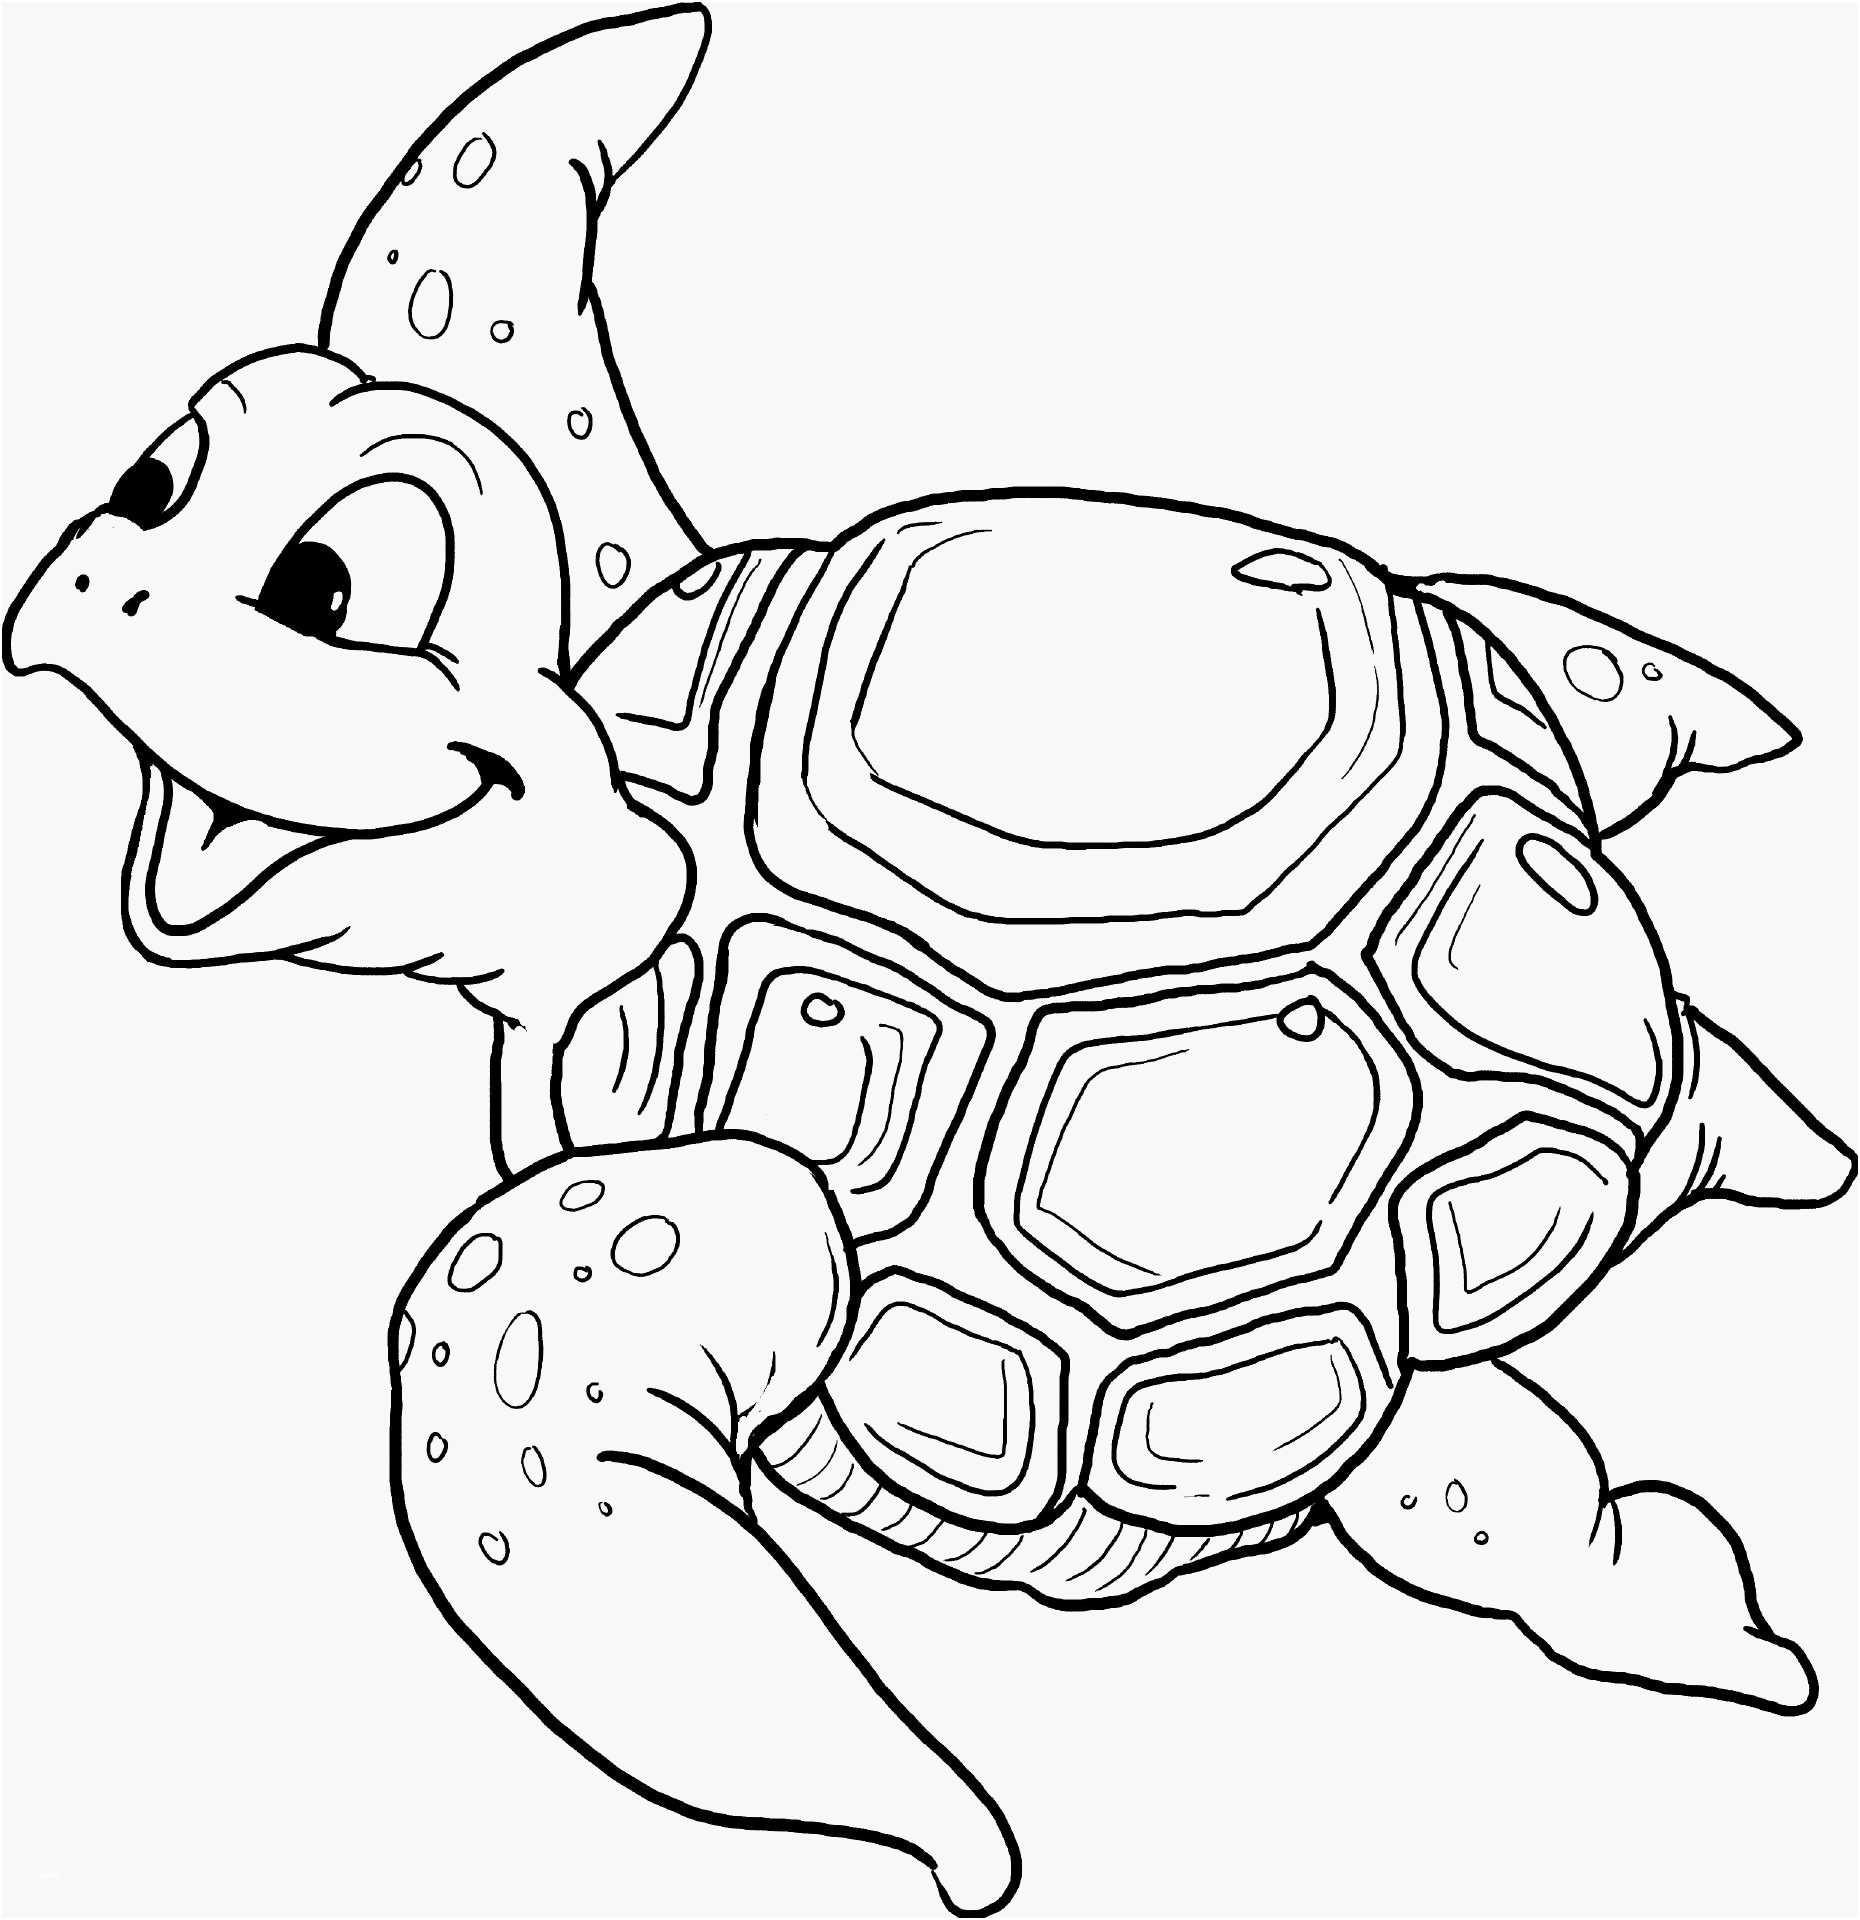 Ausmalbilder Ninja Turtles Neu Teenage Mutant Ninja Turtles Legends Gameplay Walkthrough Part 1 Fotos